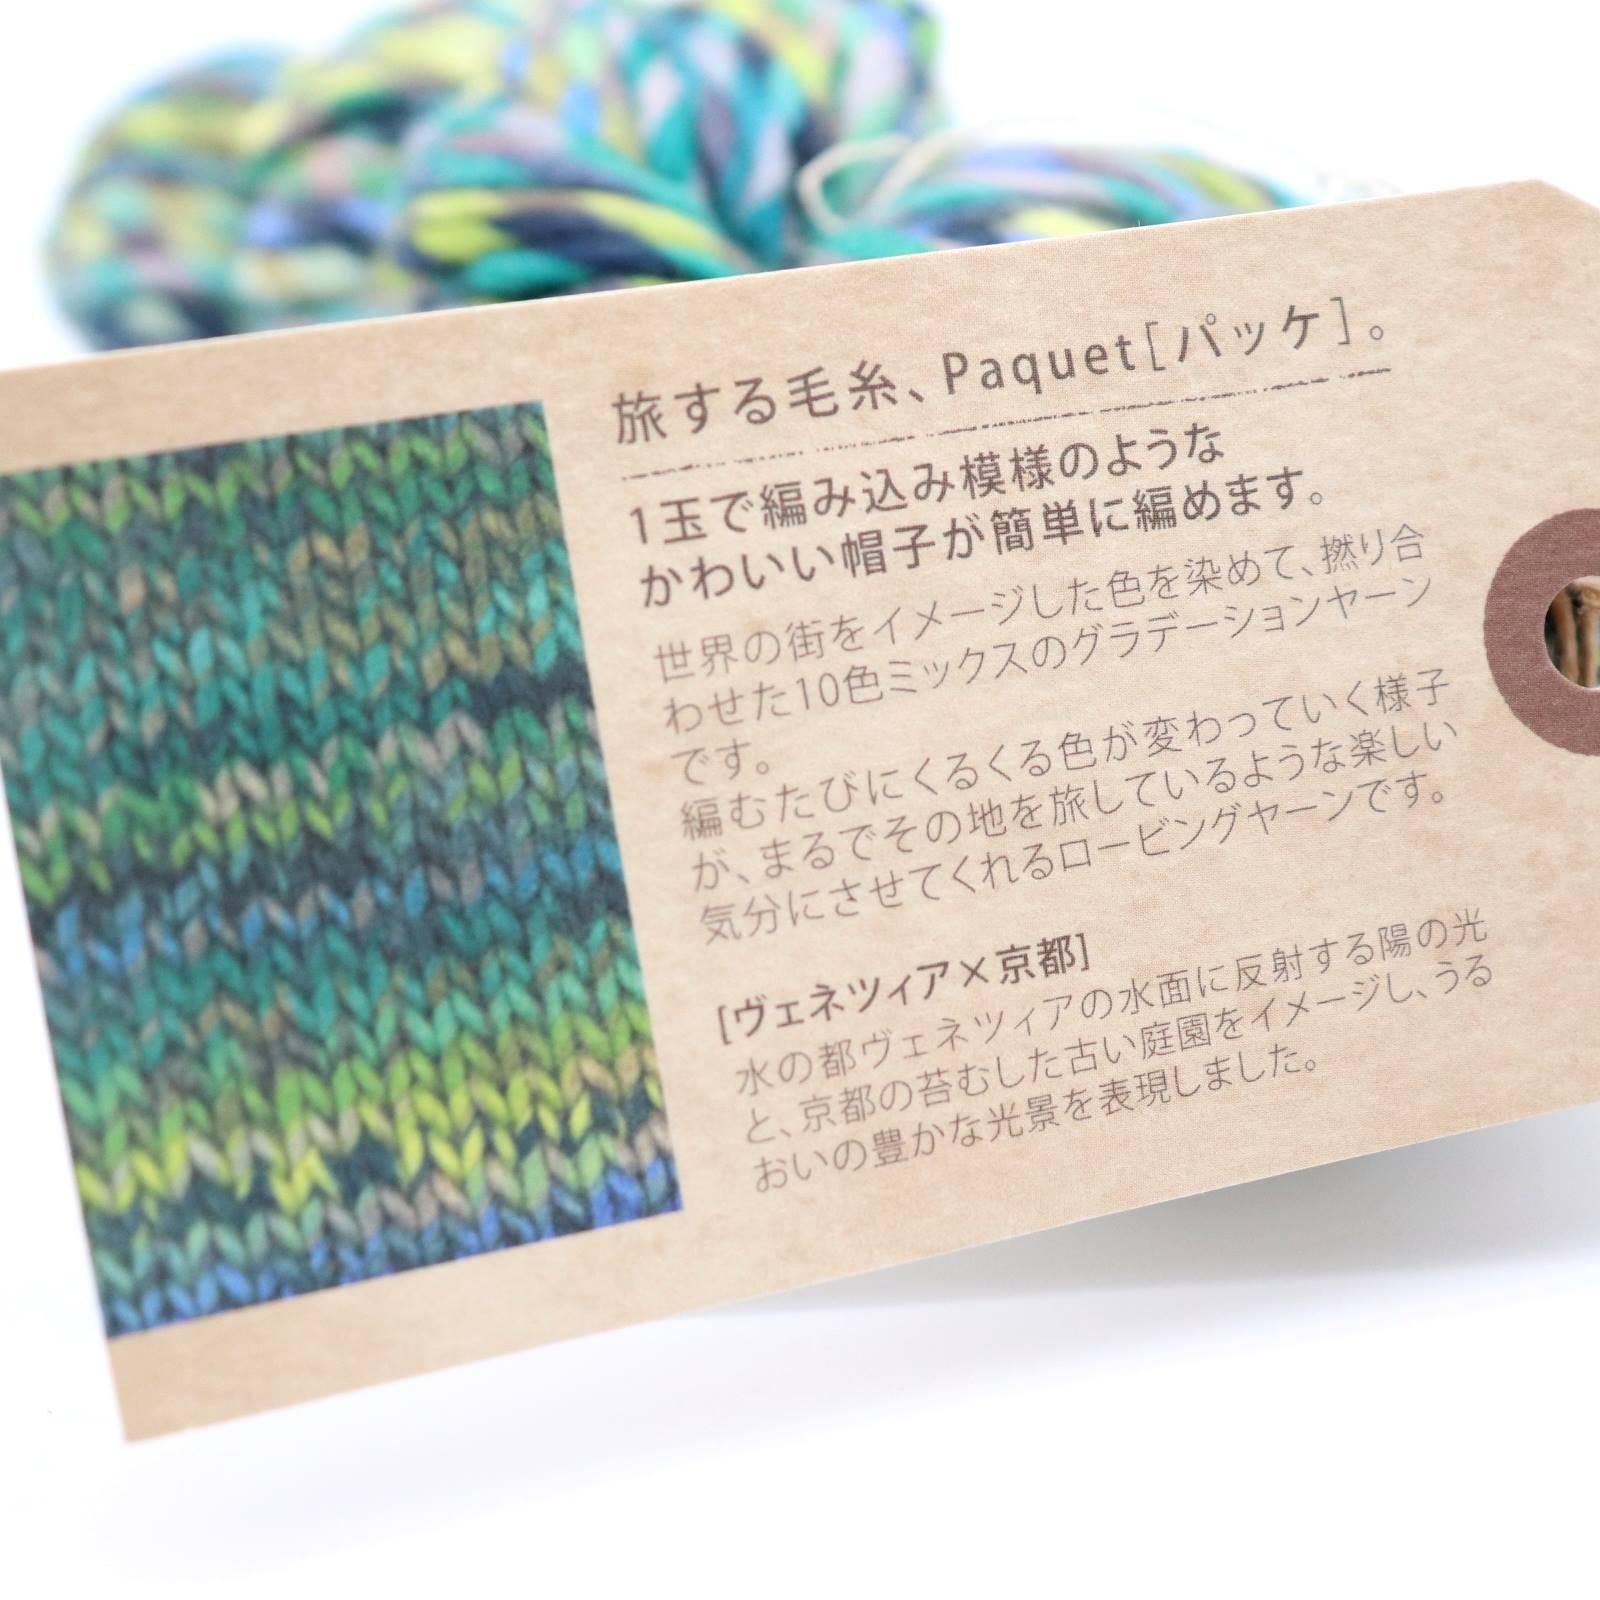 【81%OFF】ハマナカ パッケ Paquet